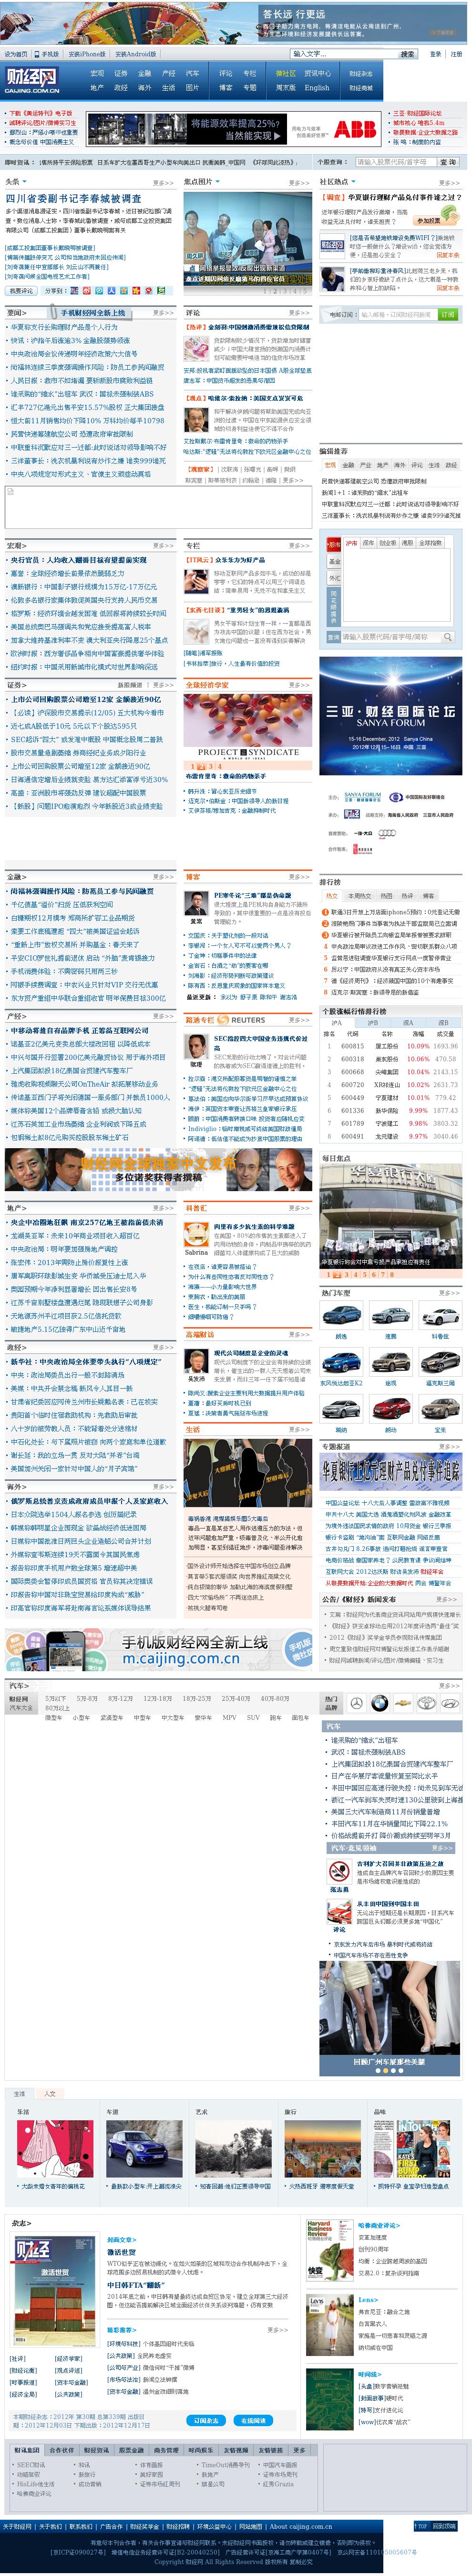 Caijing at Wednesday Dec. 5, 2012, 7:03 a.m. UTC